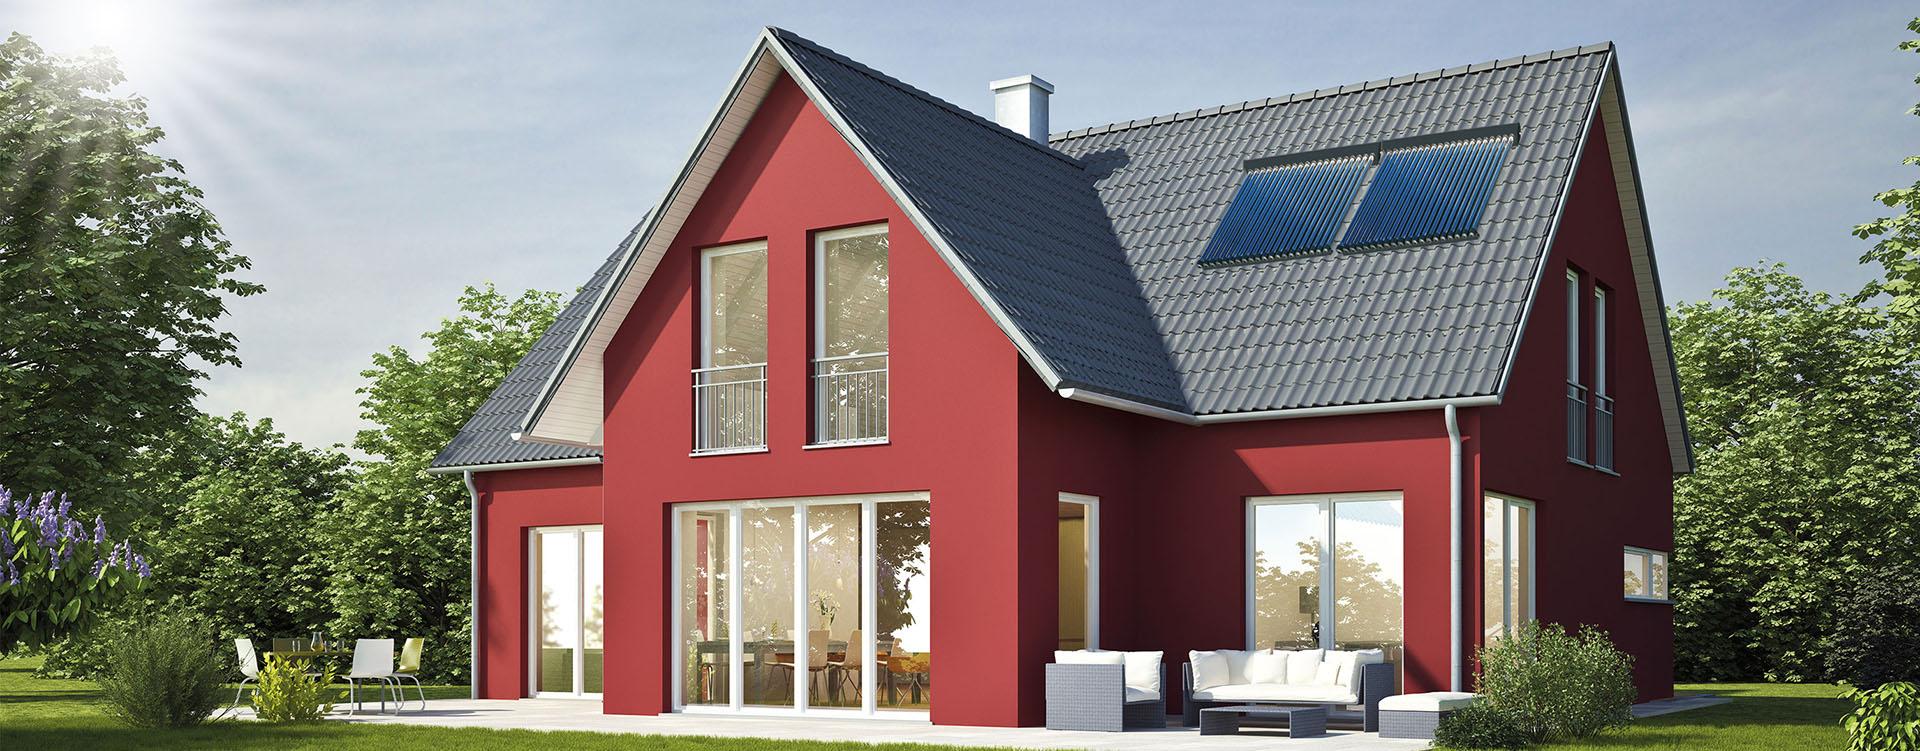 solar energie k pper hoffmann gmbh in euskirchen wisskirchen. Black Bedroom Furniture Sets. Home Design Ideas